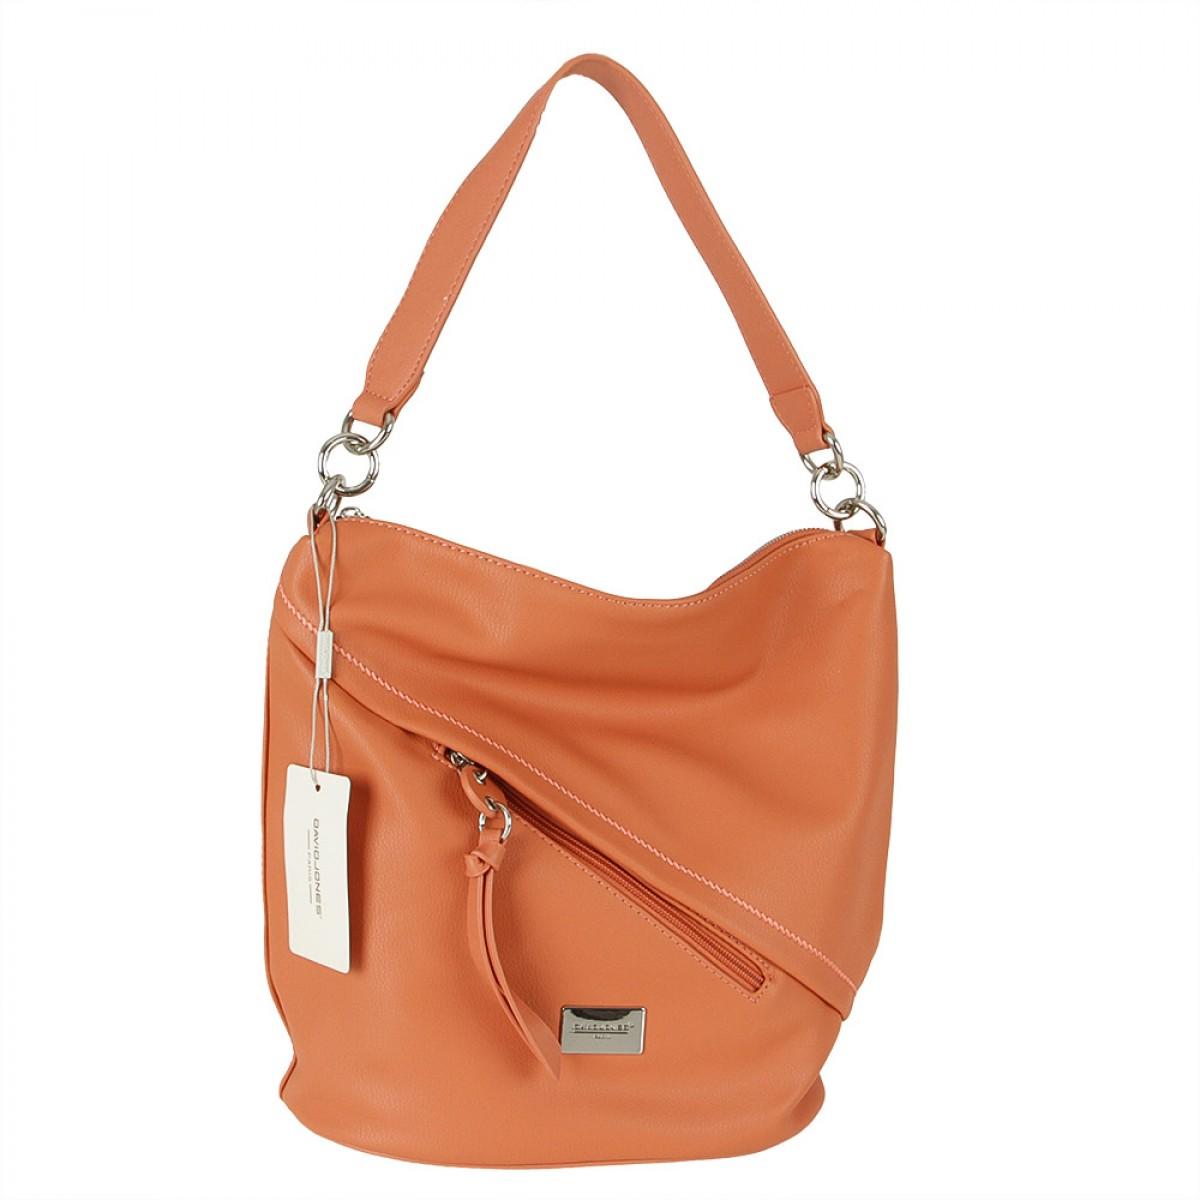 Жіноча сумка David Jones  6265-1 CORAL